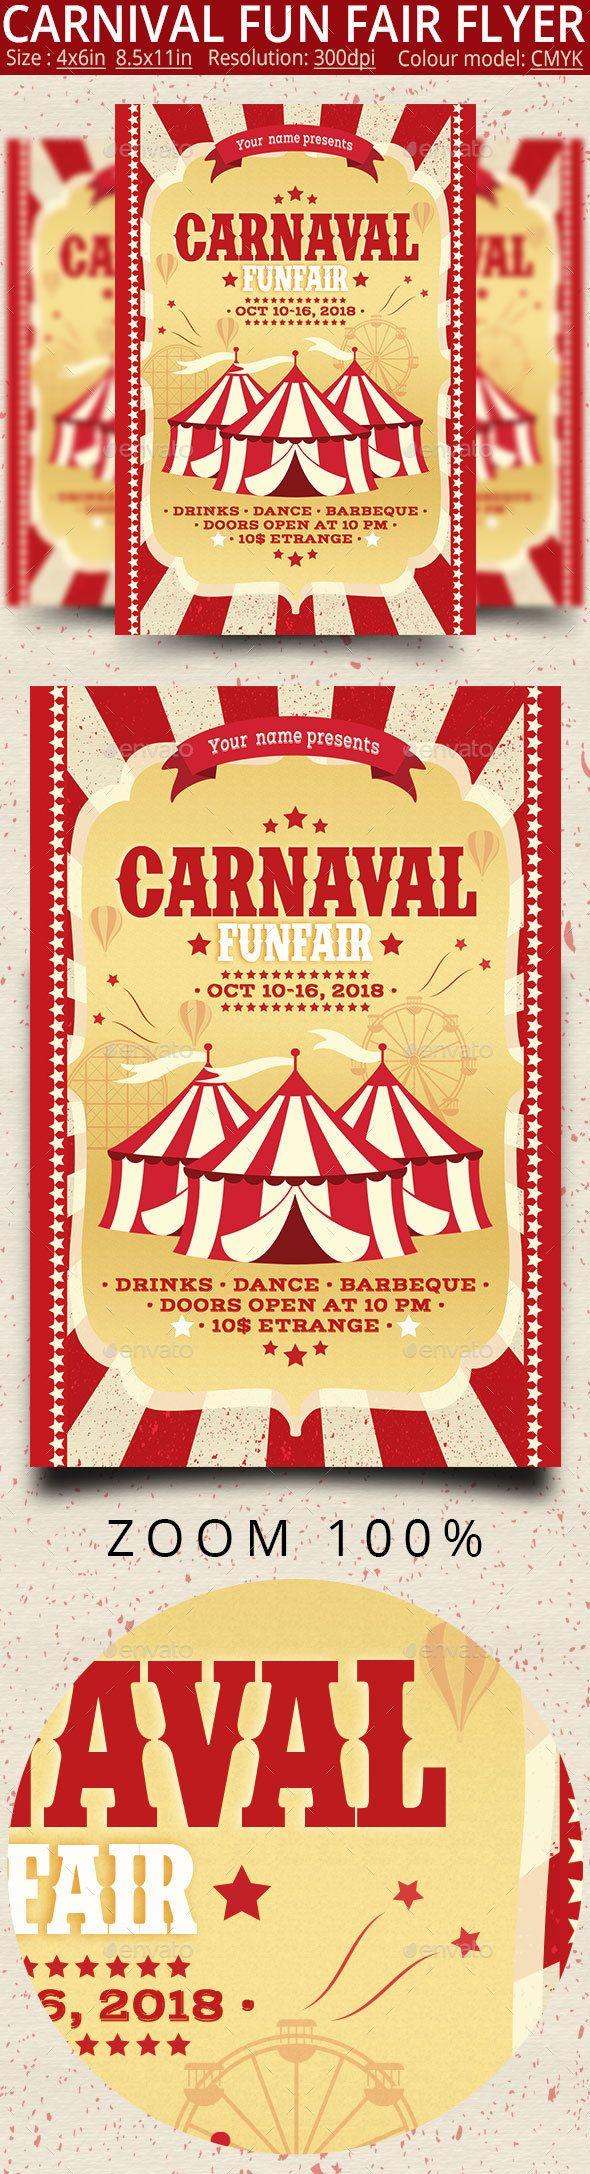 Carnival Fun Fair Flyer Poster -  amusement, birthday, carnival, carnival flyer, celebration, circus, circus intro, circus opener, circus tent, county fair, decoration, entertainment, event, fair, festival, flag, flyer, fun, funfair, happy, holiday, invitation, kids, party, show, summer, tent, vector illustration, vintage